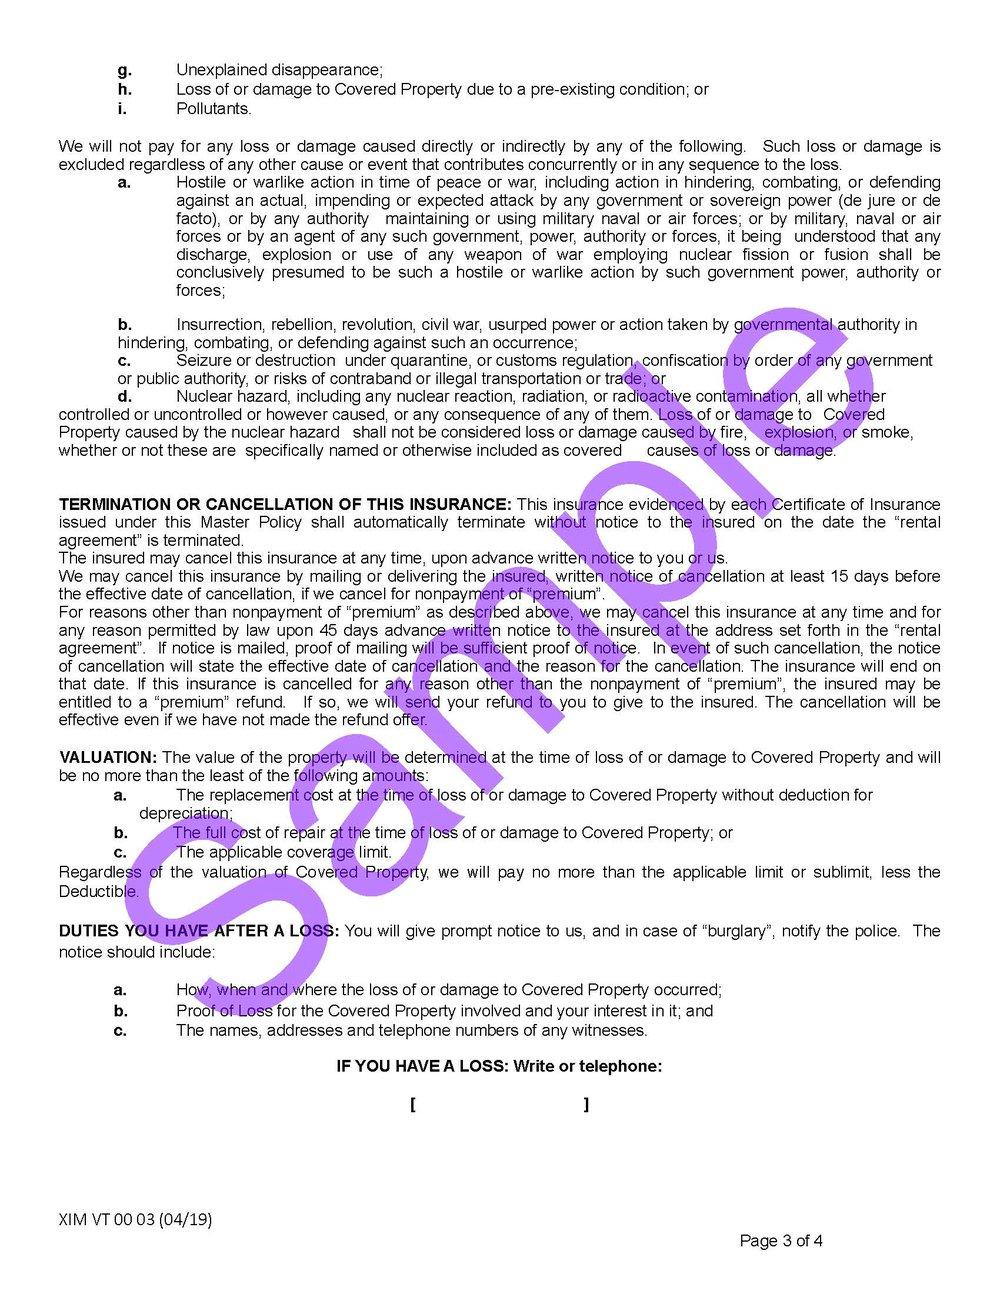 XIM VT 00 03 04 19 Vermont Certificate of InsuranceSample_Page_3.jpg